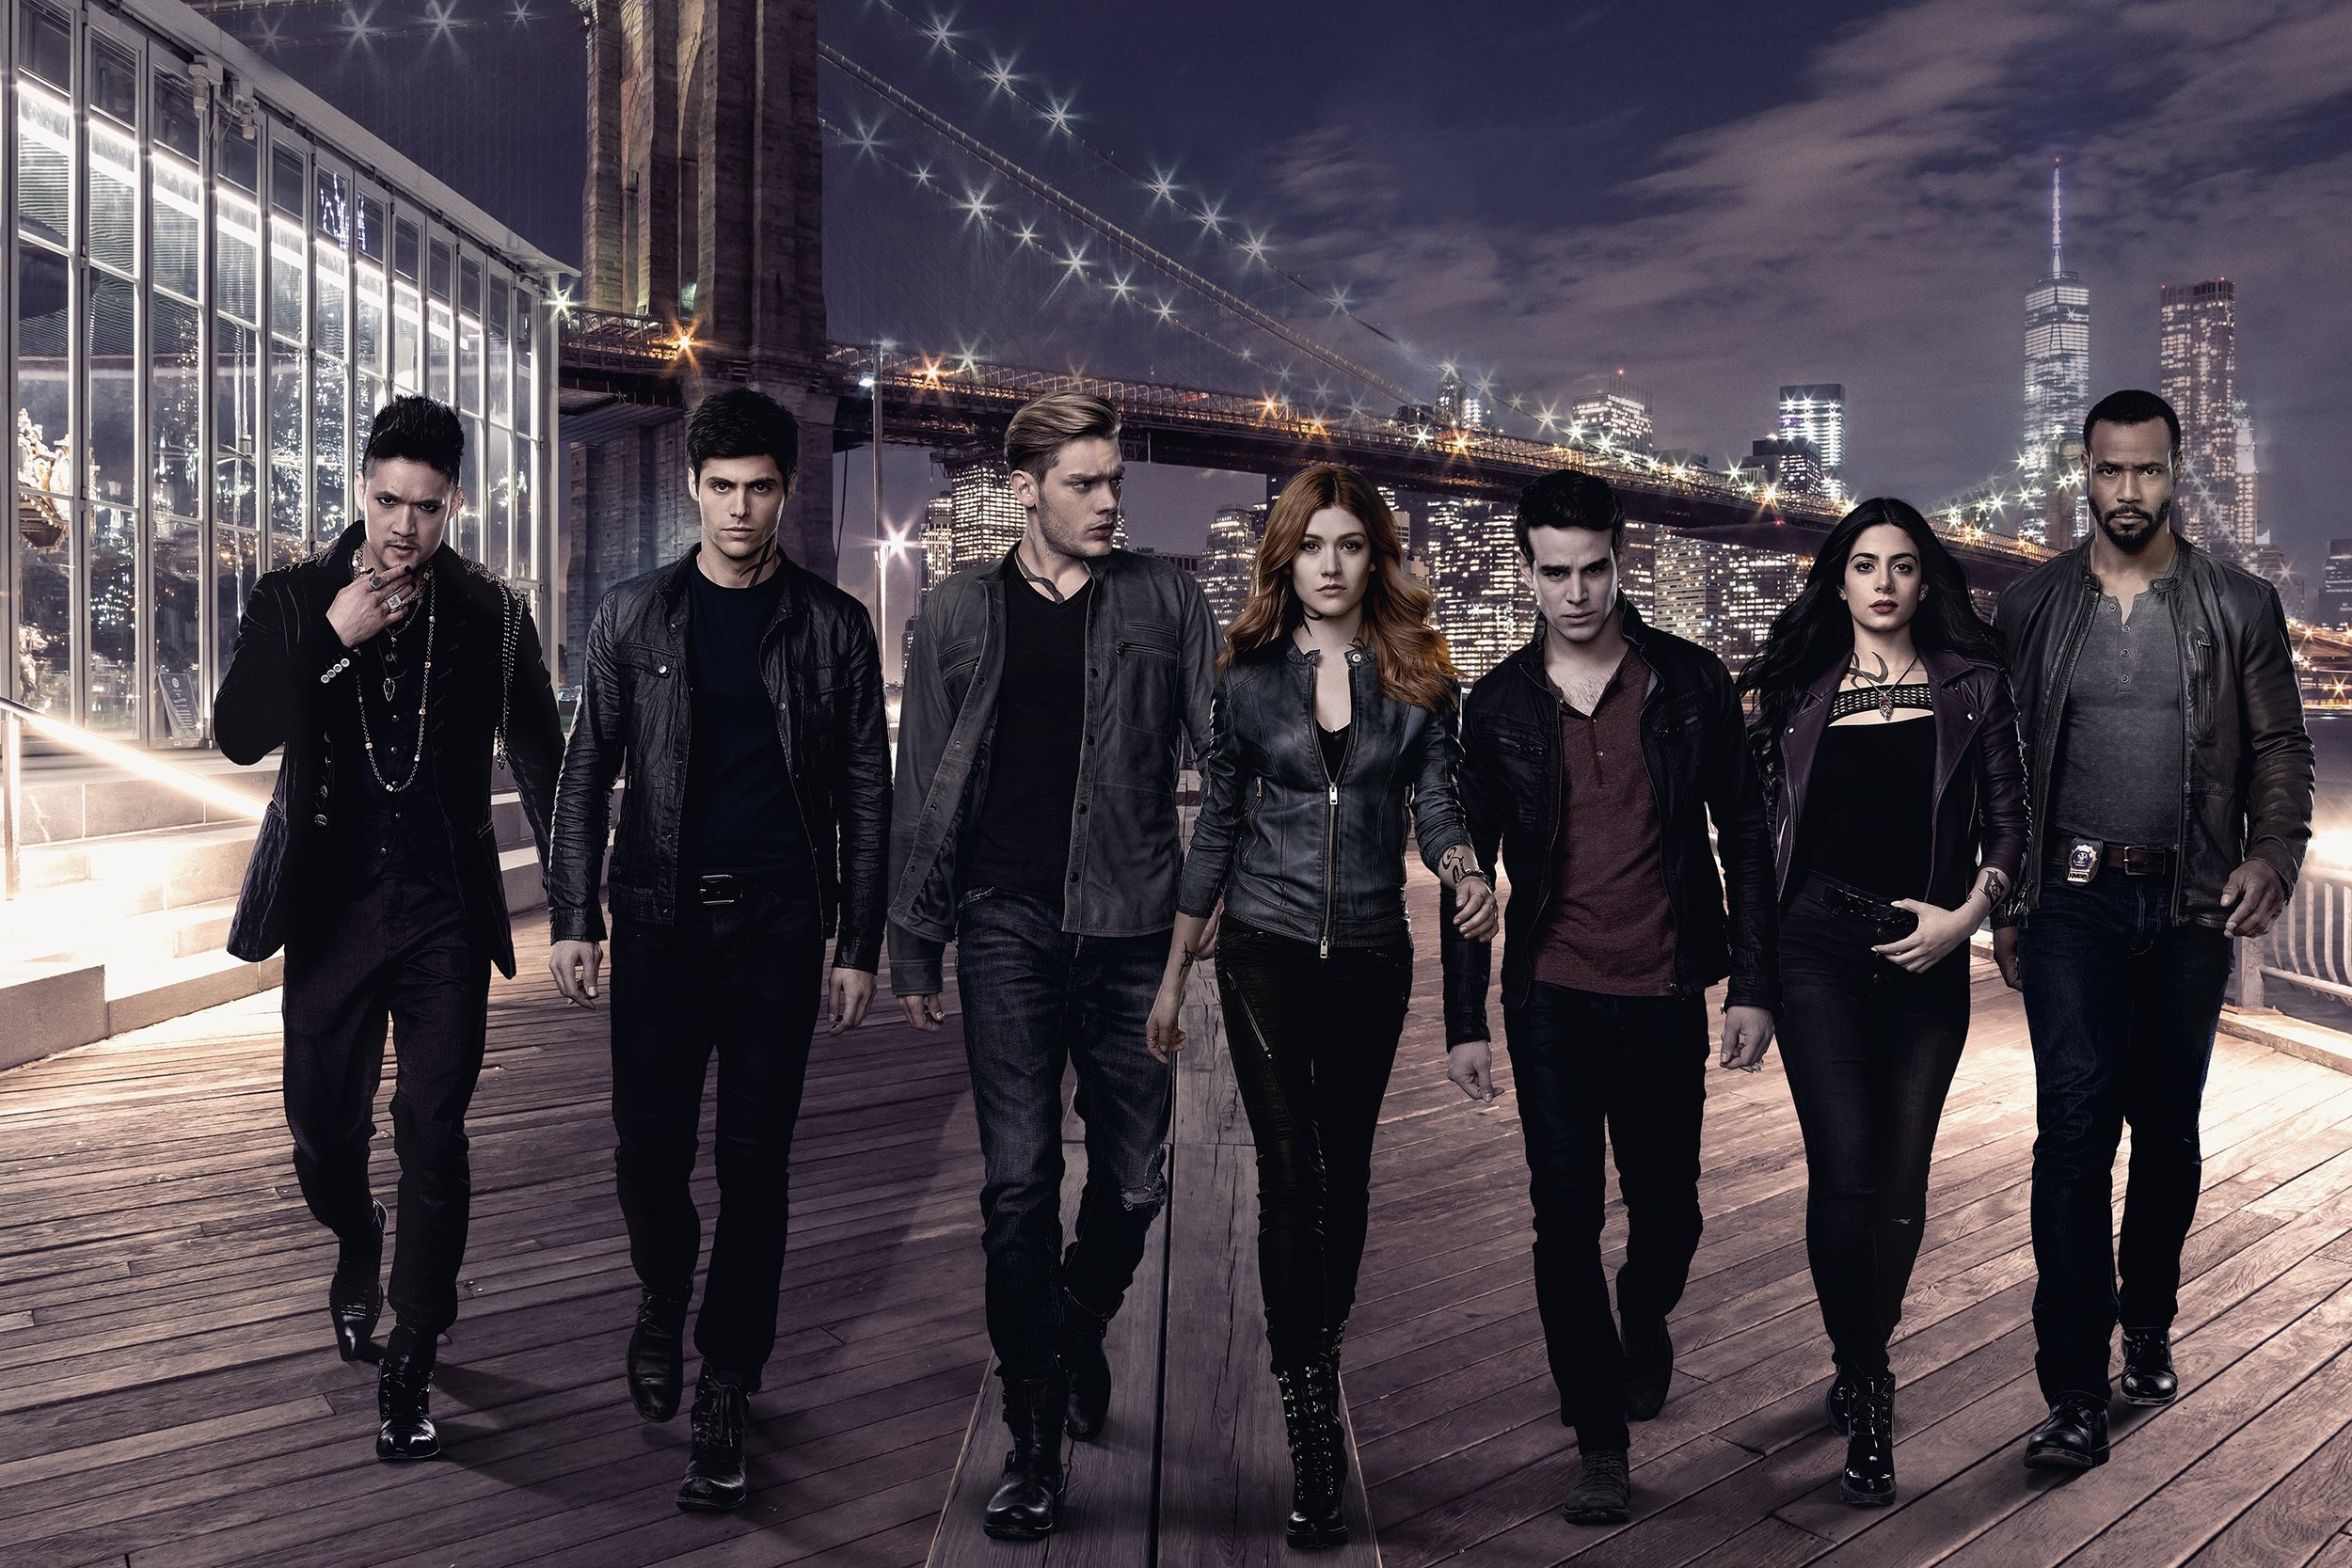 Left to right: Magnus Bane, Alec Lightwood, Jace Wayland, Clary Fray, Simon Lewis, Isabelle Lightwood, and Luke Garroway